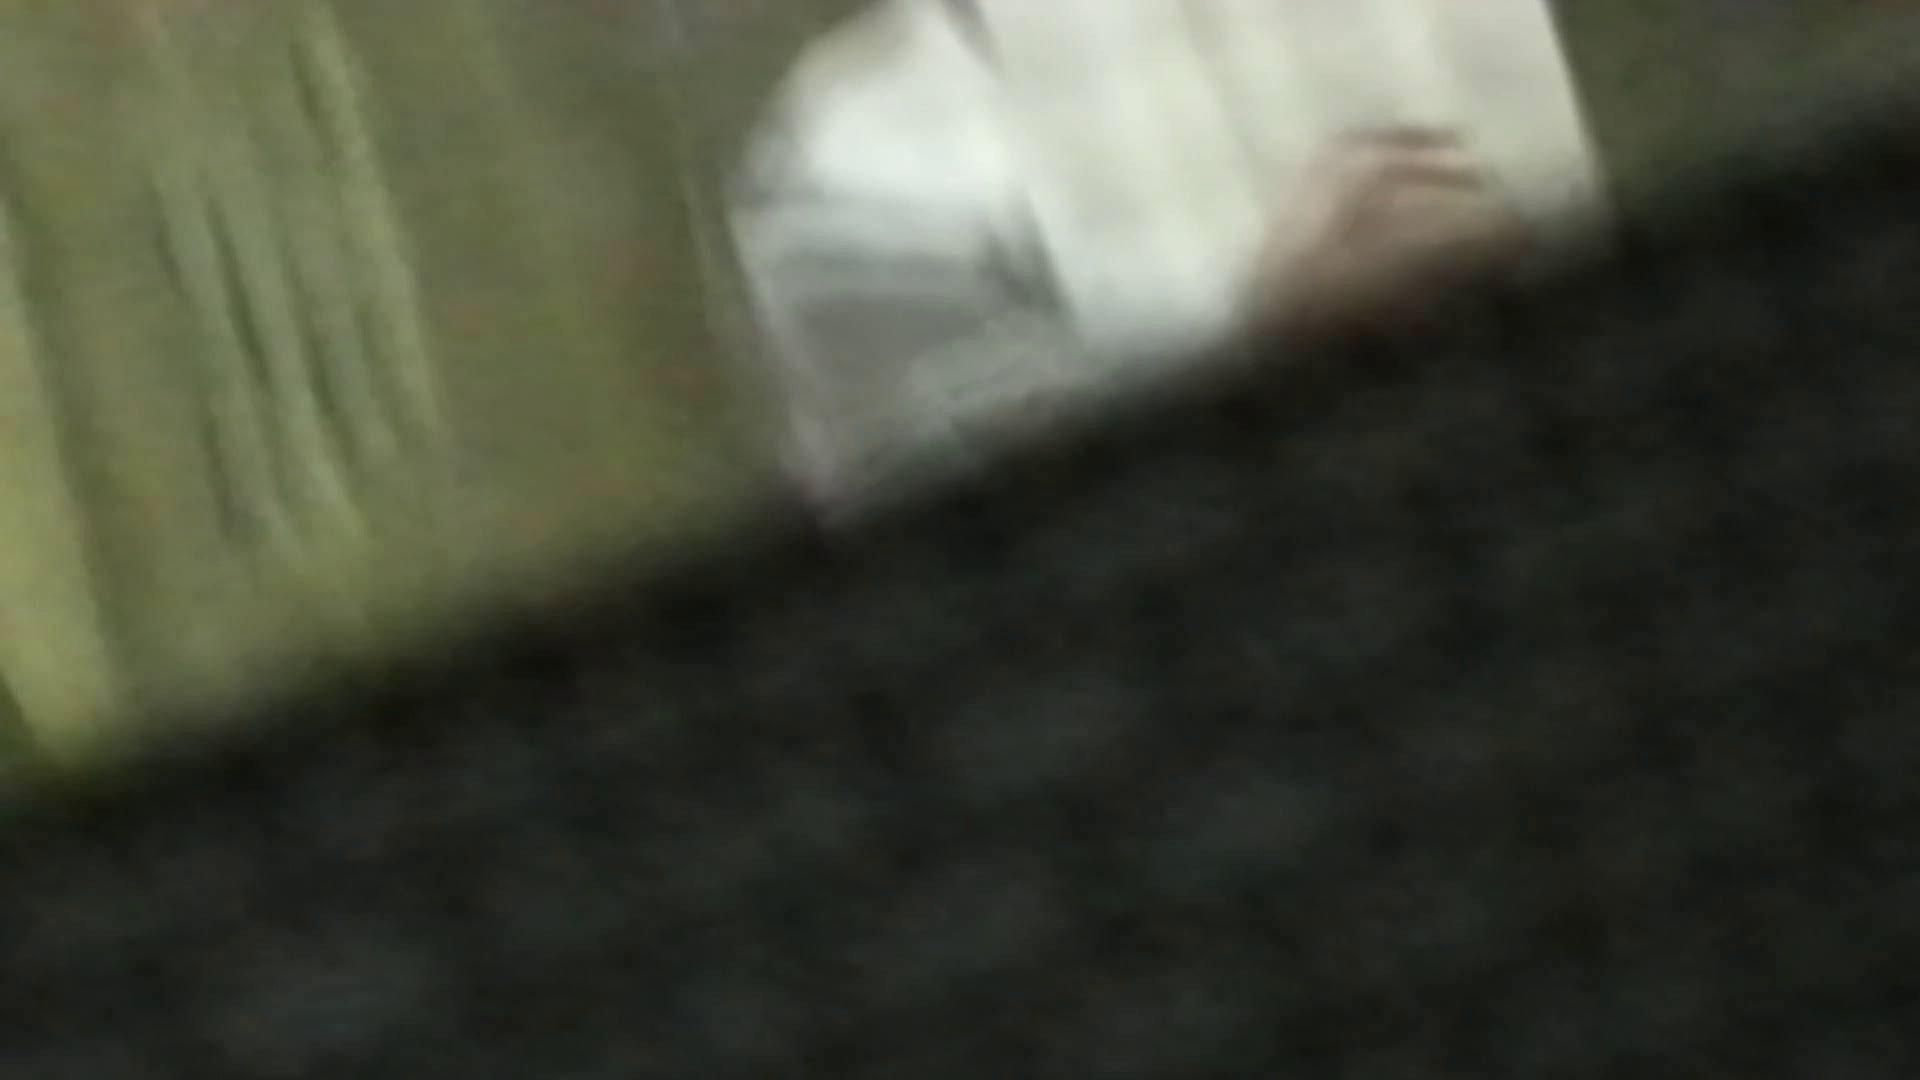 SPYさん初投稿!マンション覗き!5000K!ハイビジョン撮影VOL.05(元サッカー部員社会人) スポーツマン  38pic 8